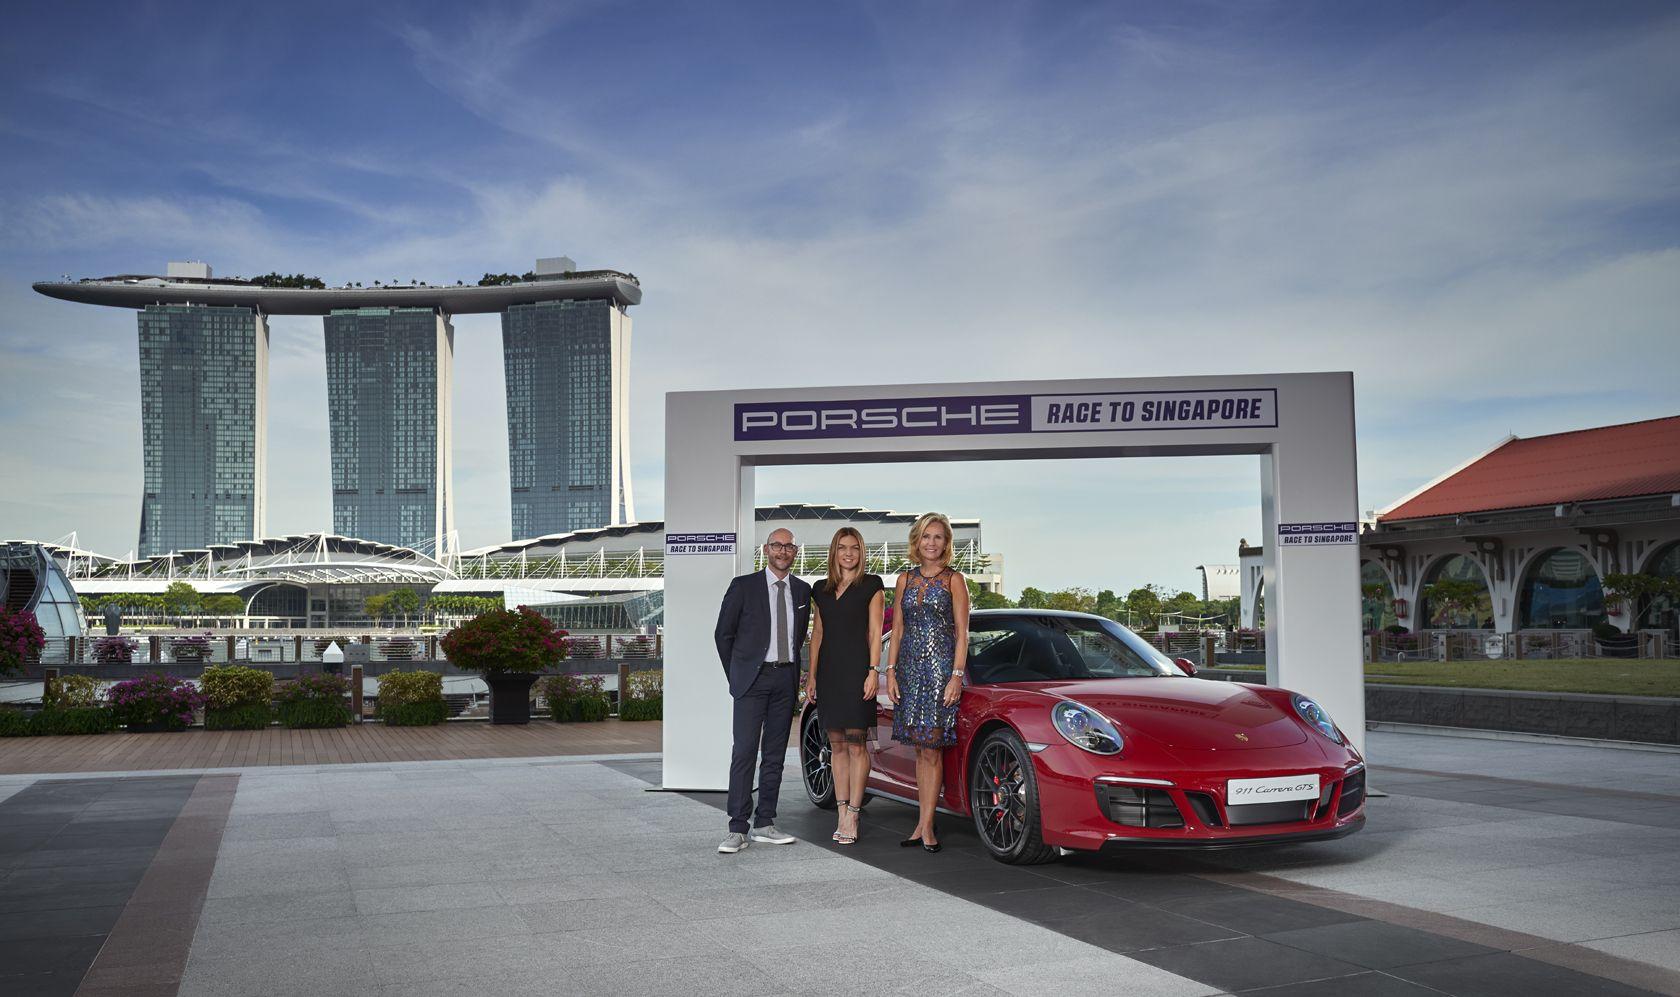 Porsche WTA Race to Singapore Marina bay sands, Marina